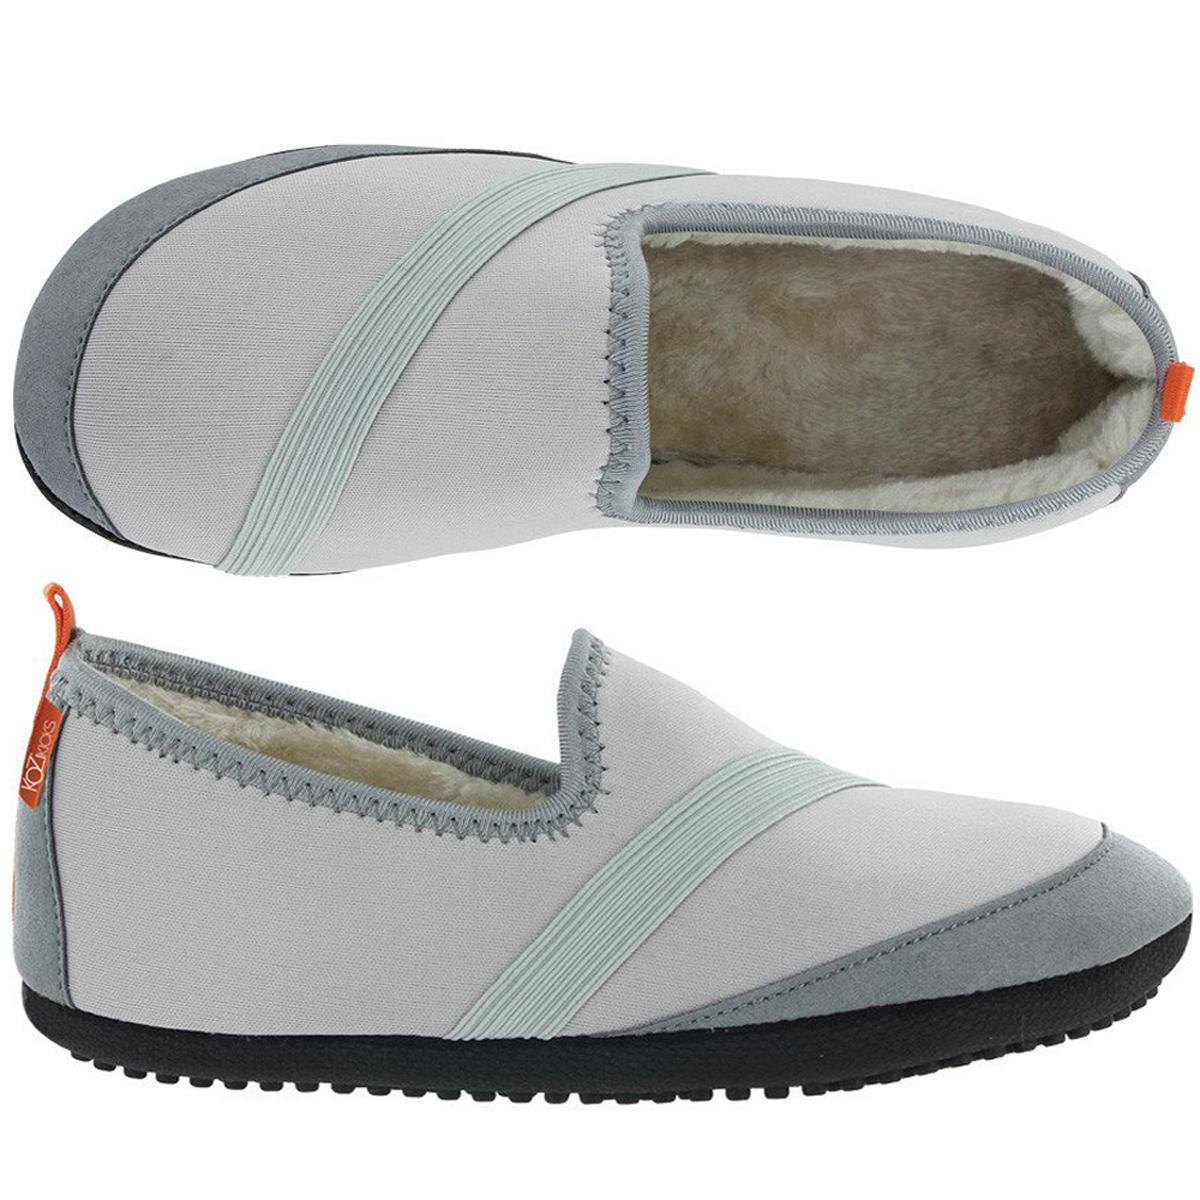 KoziKicks Women's Ergonomic Comfort Non-Slip Sole Plush